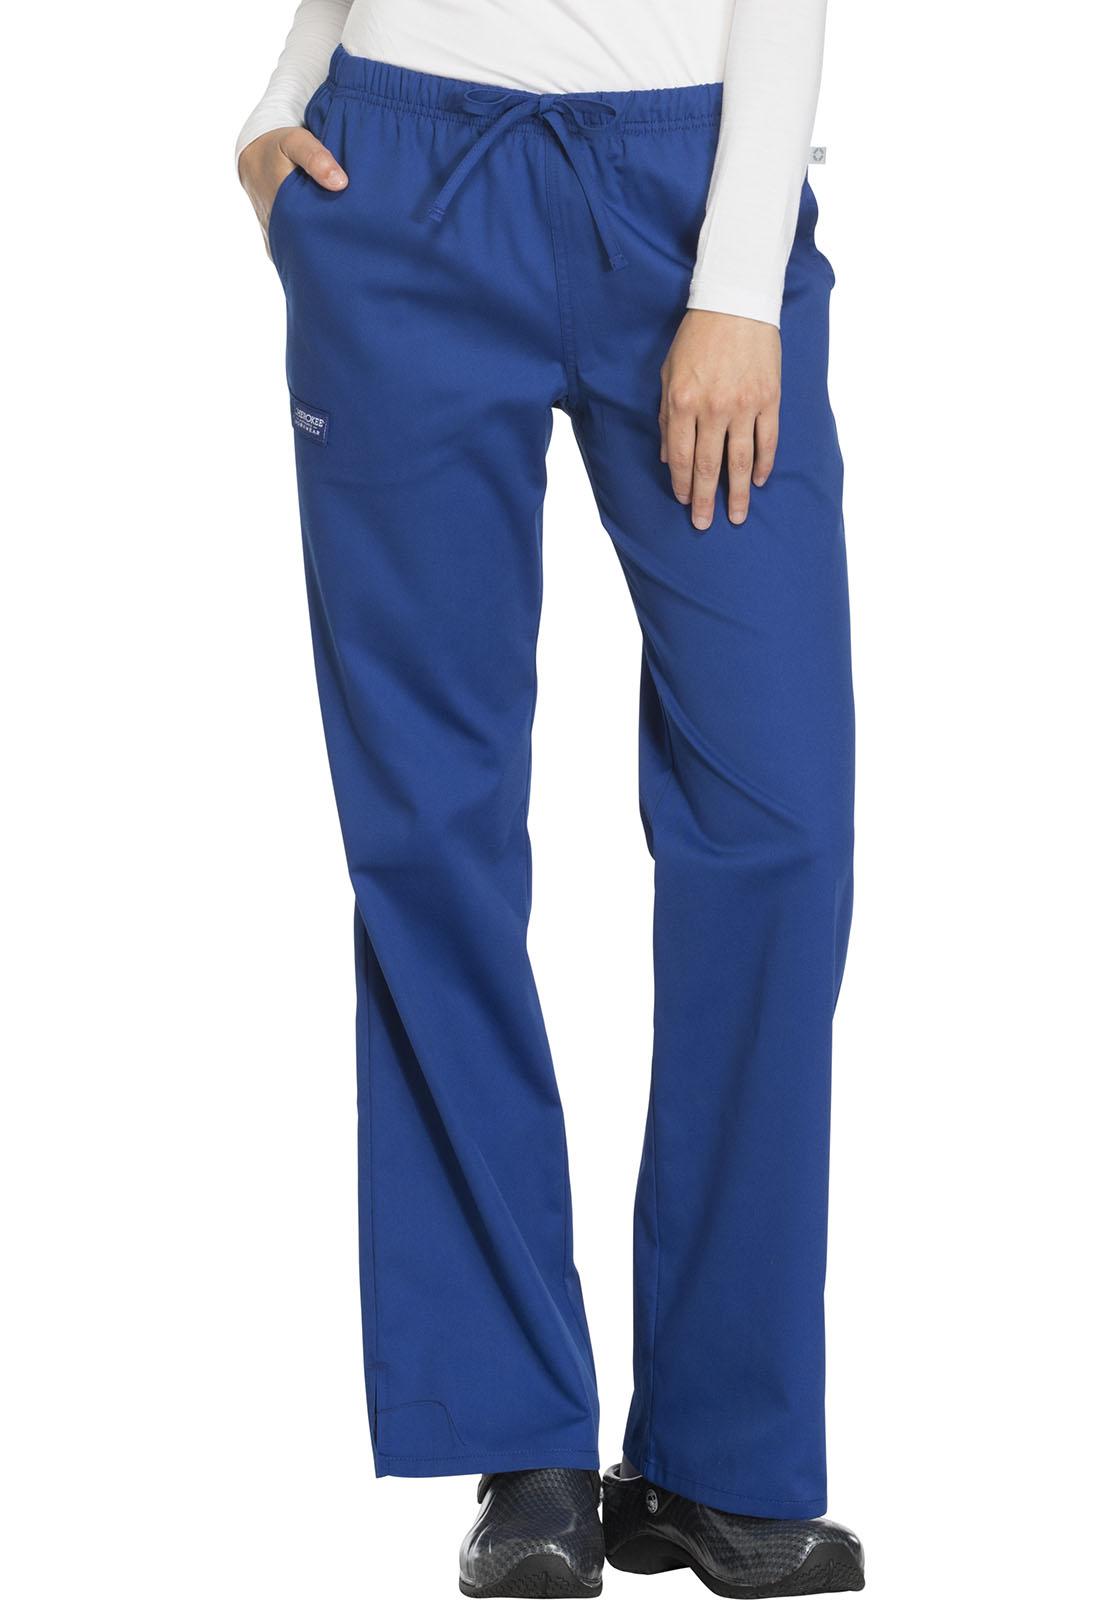 c99392819d5 WW Flex Mid Rise Moderate Flare Drawstring Pant in Galaxy Blue ...